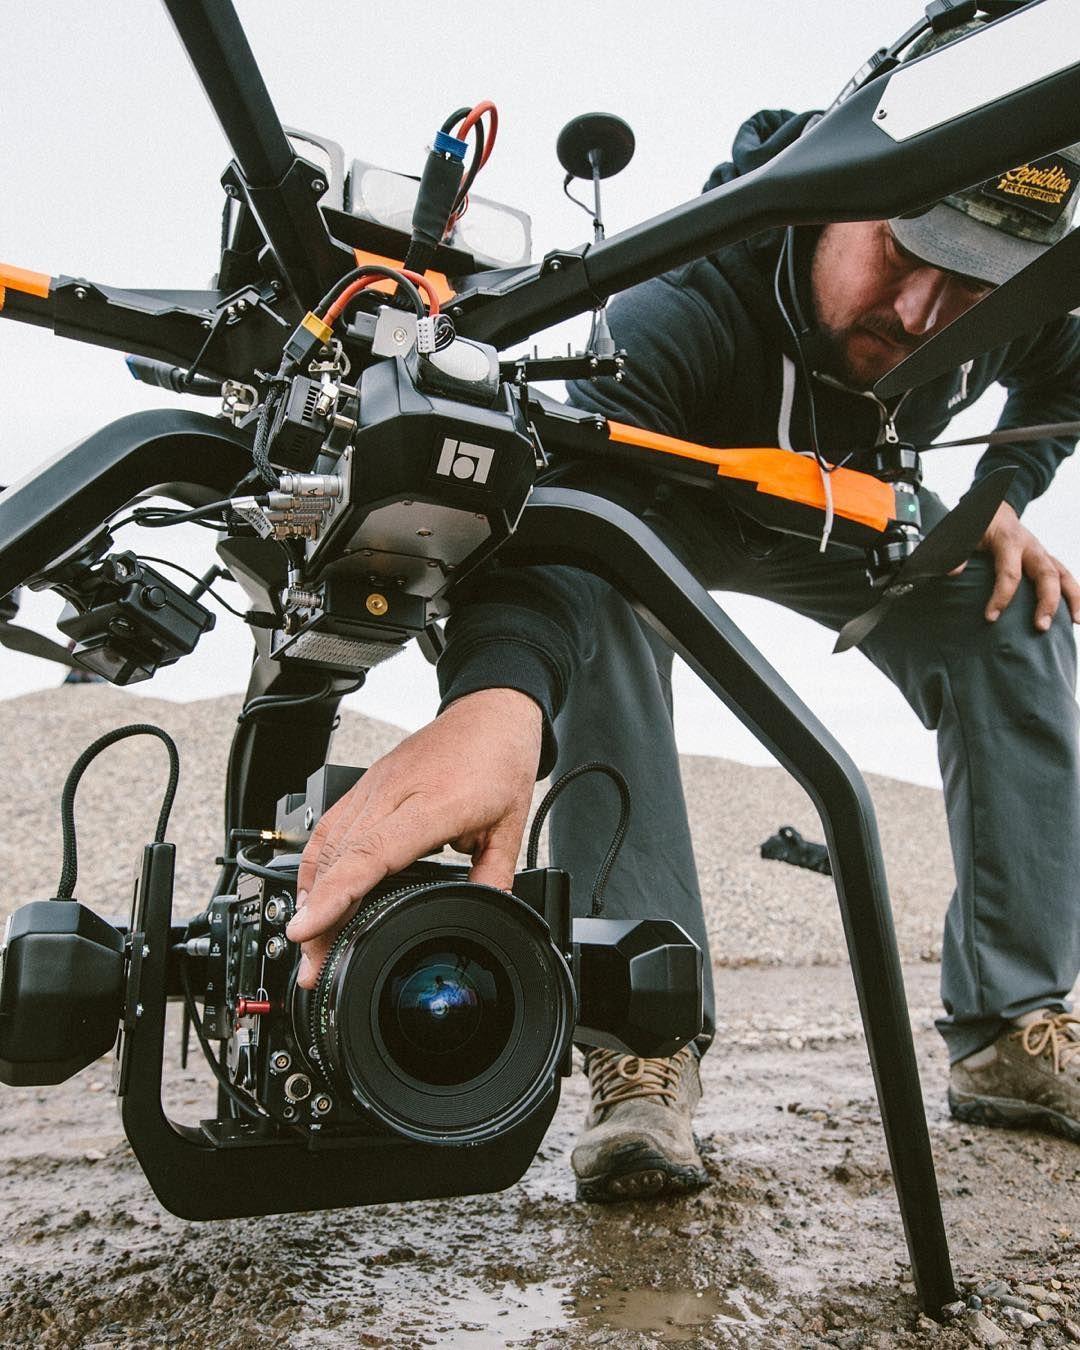 Promotion drone camera kickstarter, avis drone avec camera et casque virtuel